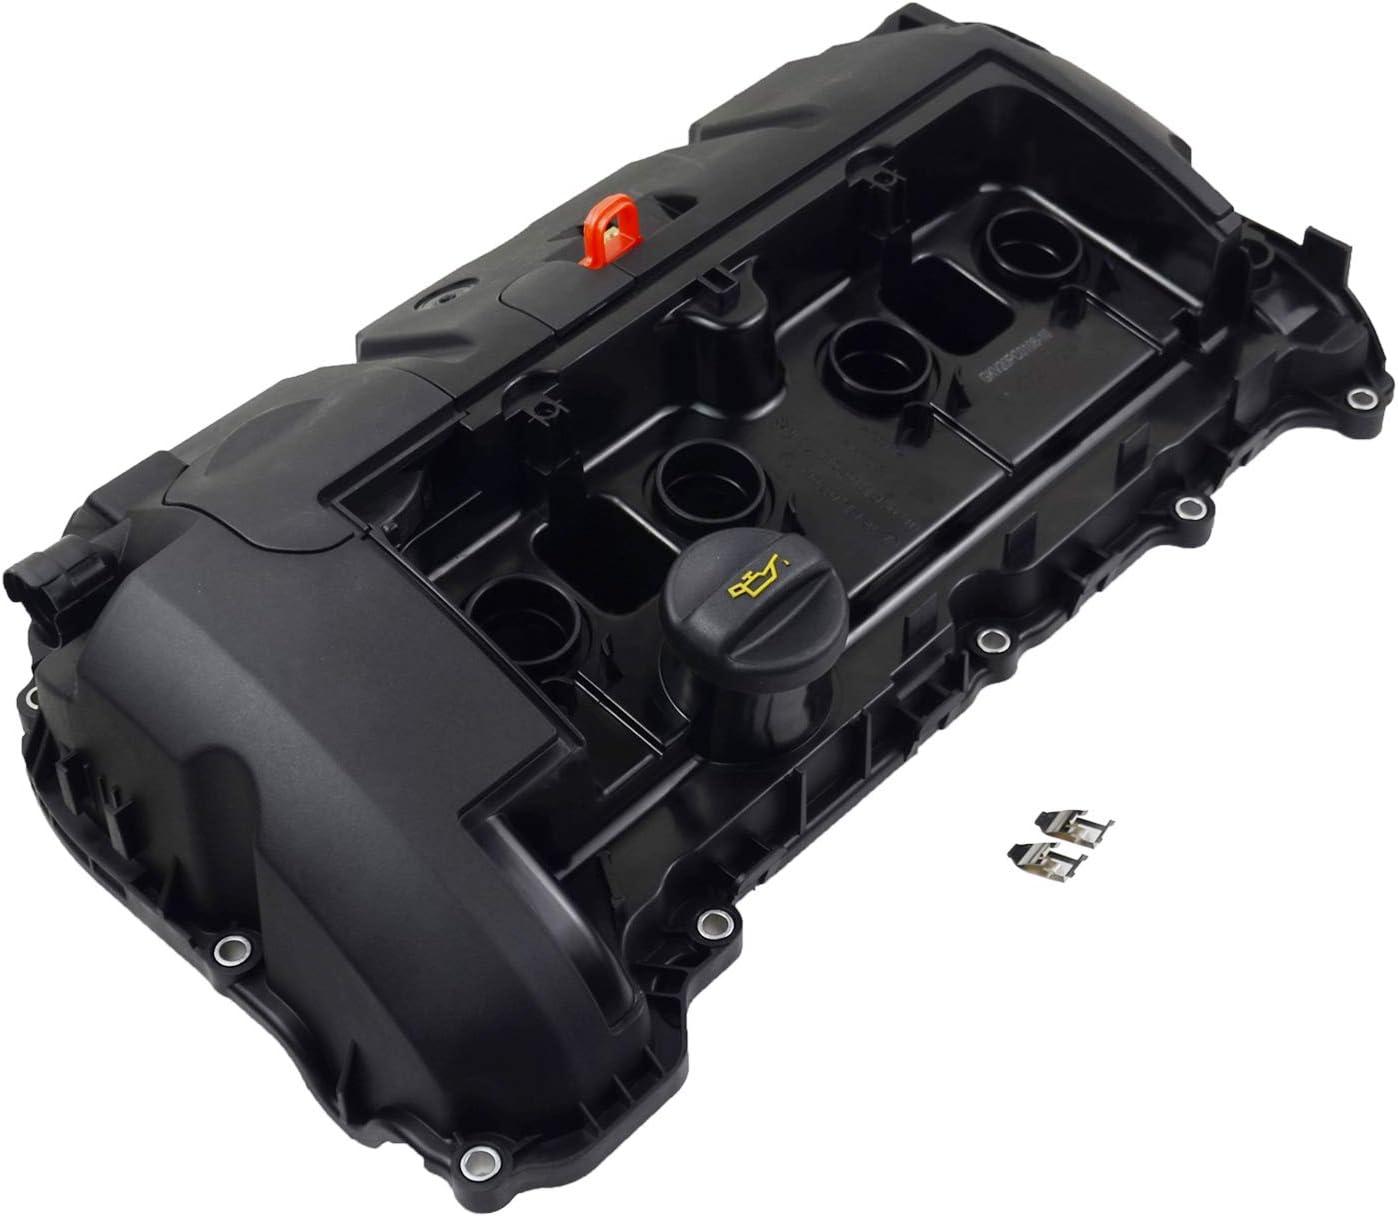 CDYSS Engine Cylinder Valve Cover w//Gasket Part#11127646554 11127553799 for MINI N12 N16 R55 R56 R57 R58 R59 R60 R61 Rocker Valve Cover